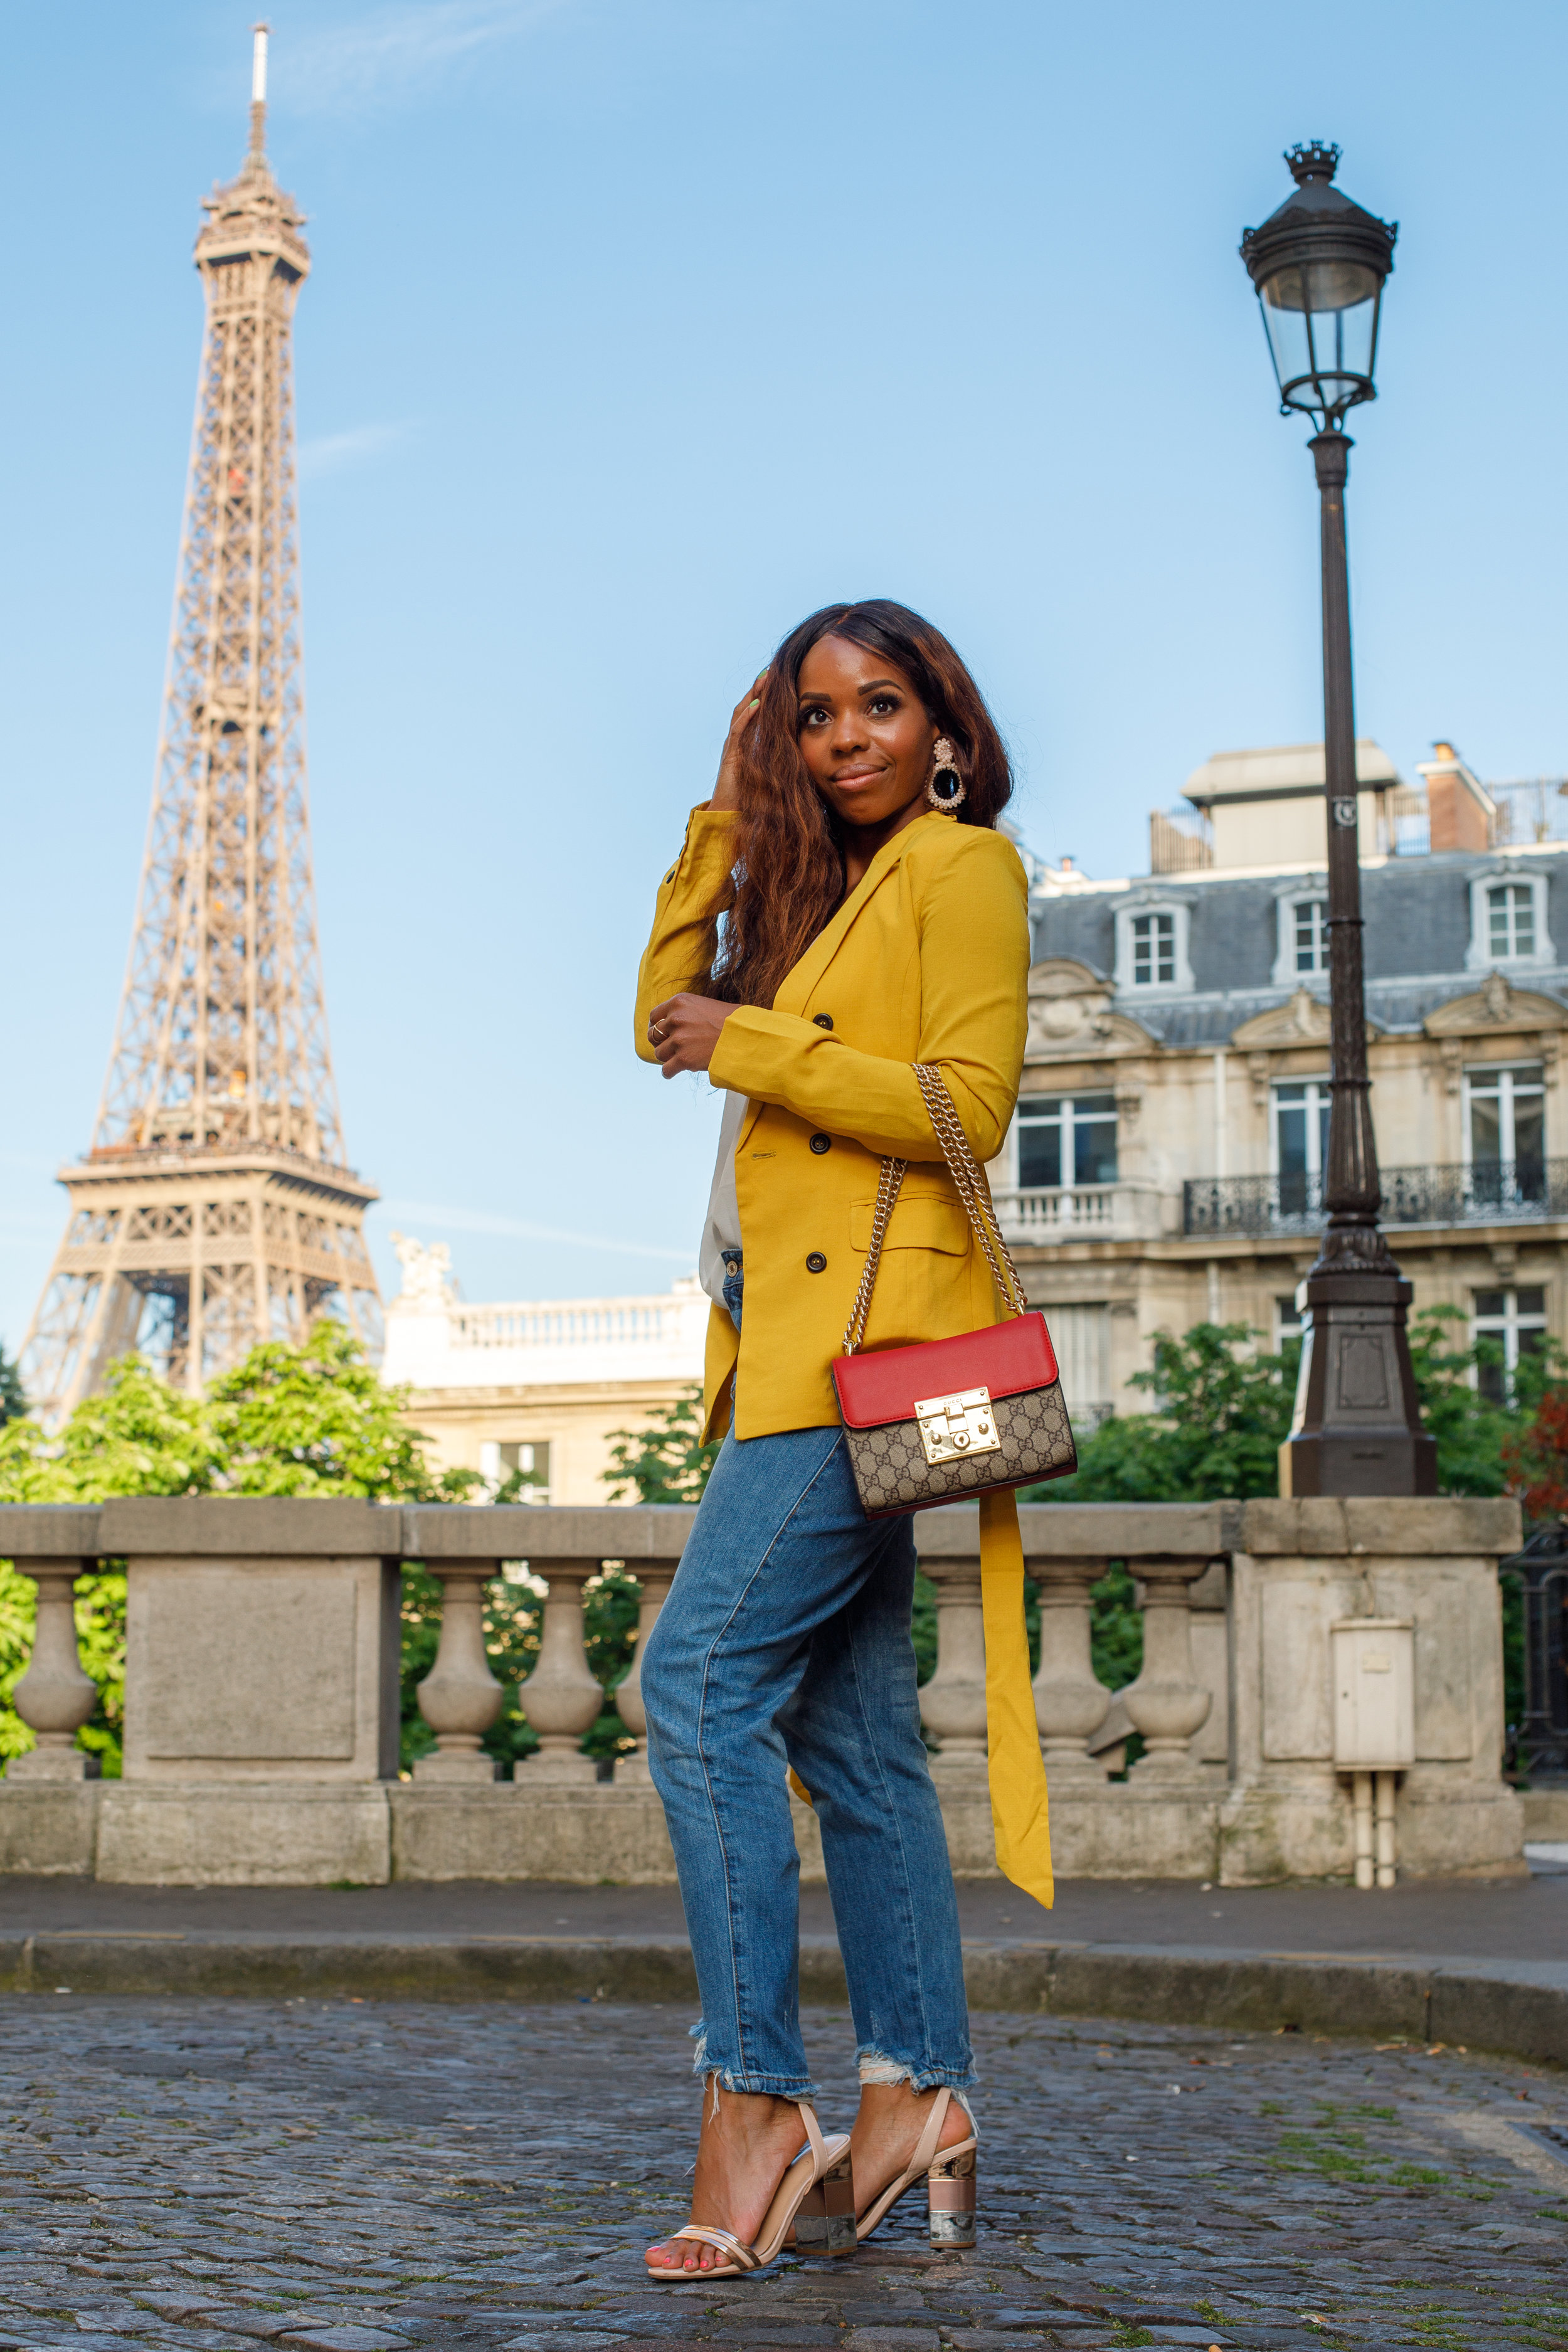 Parisian Outfit Inspiration